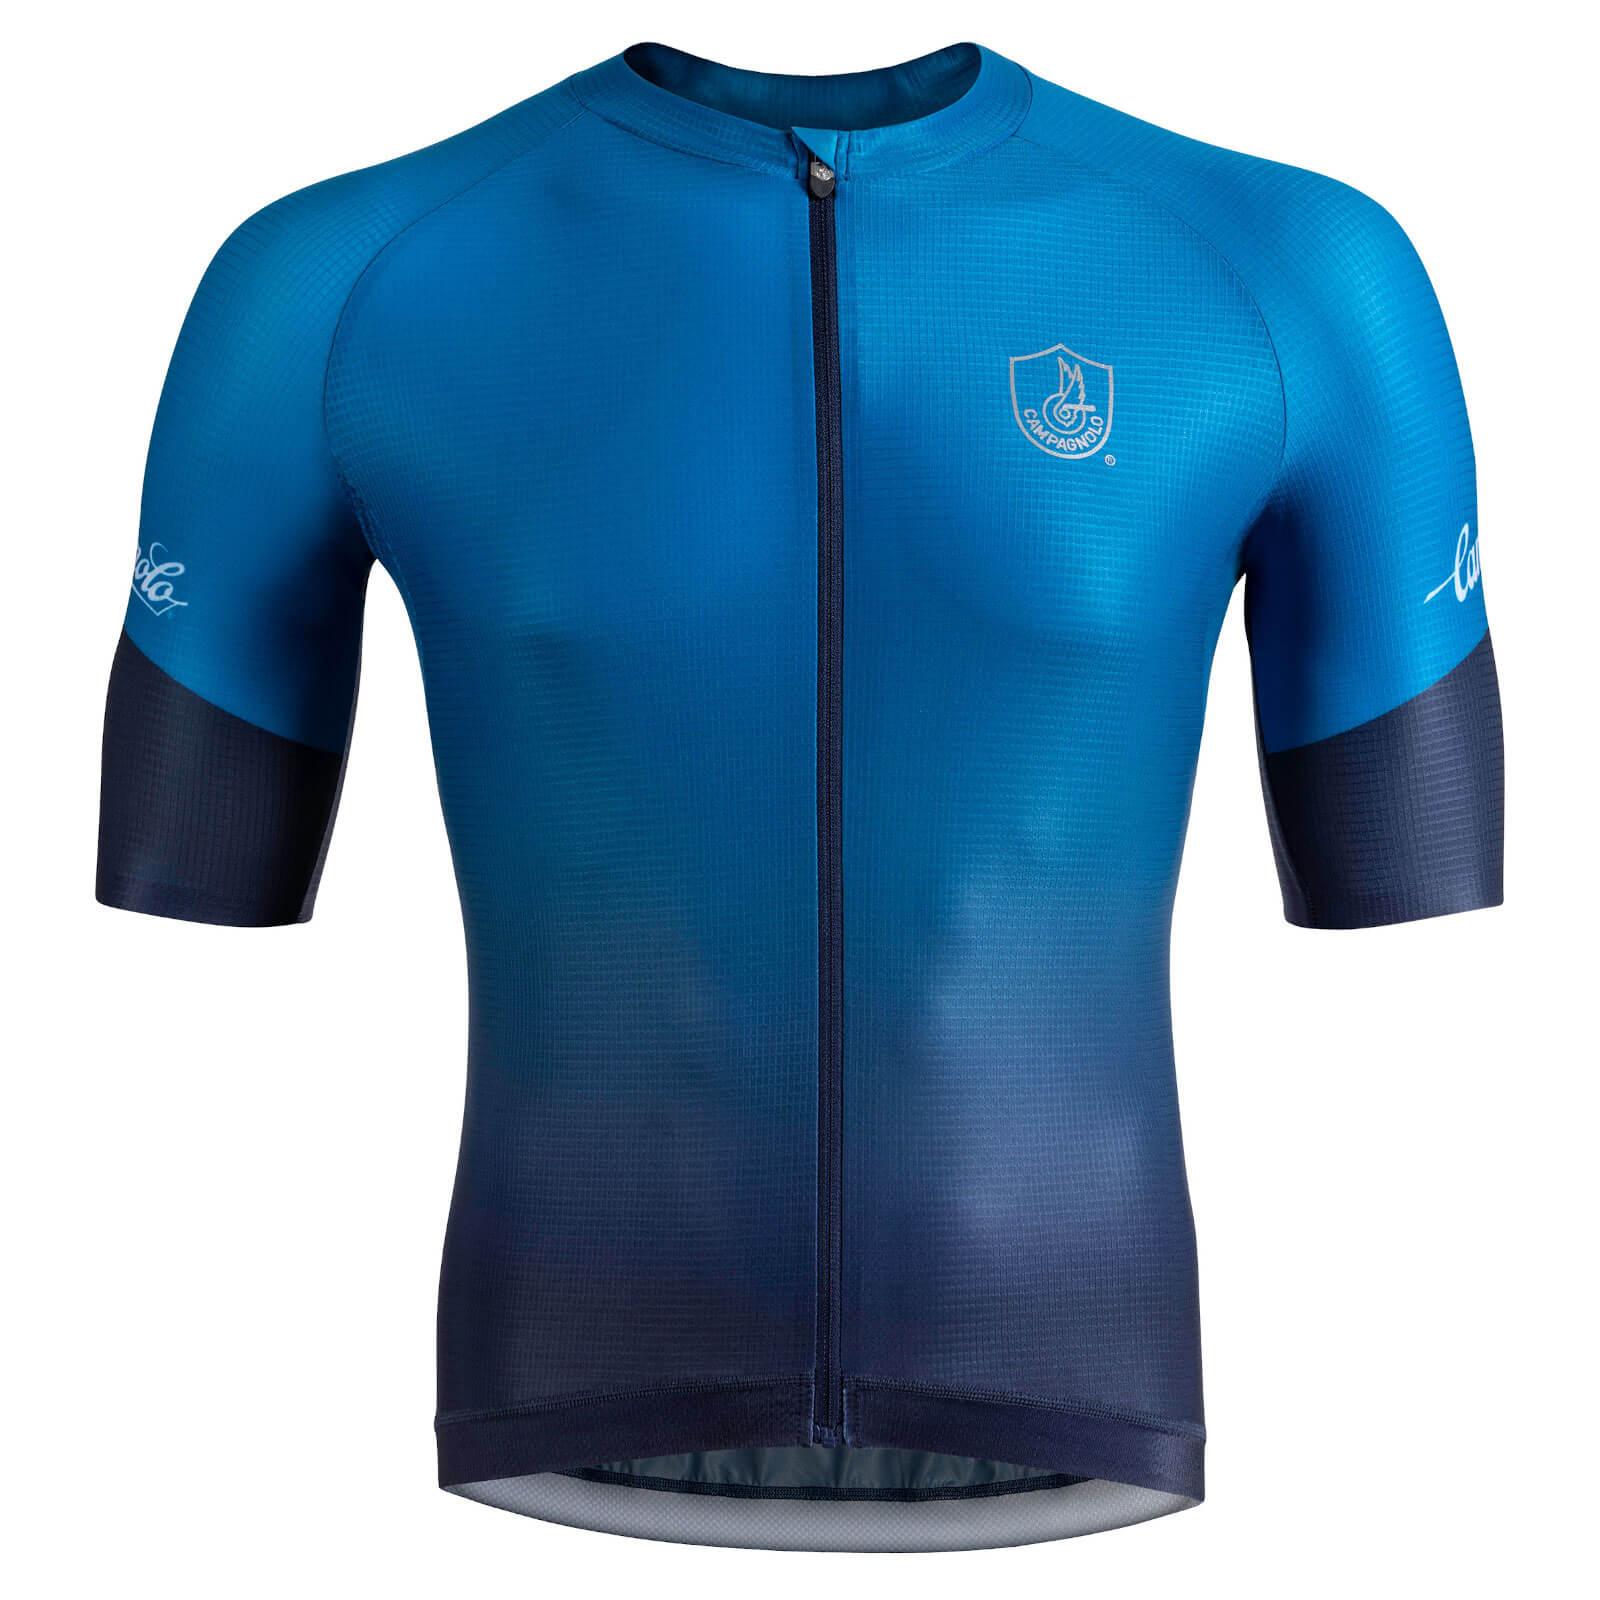 Nalini Campagnolo Platino Jersey - XL - Blue/Navy Blue